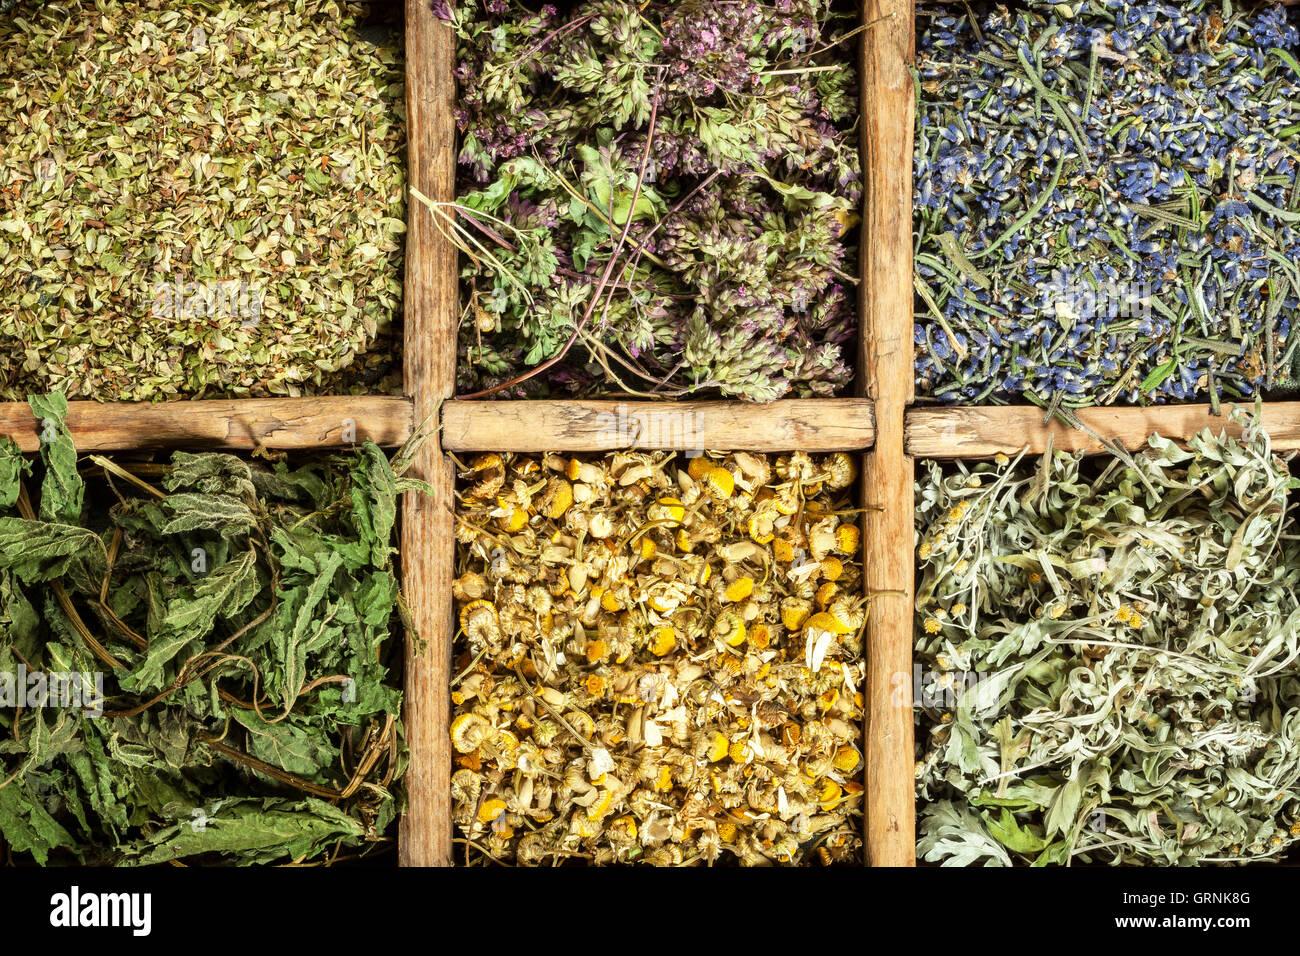 Médicos Hierbas secas surtidas de té. Imagen De Stock